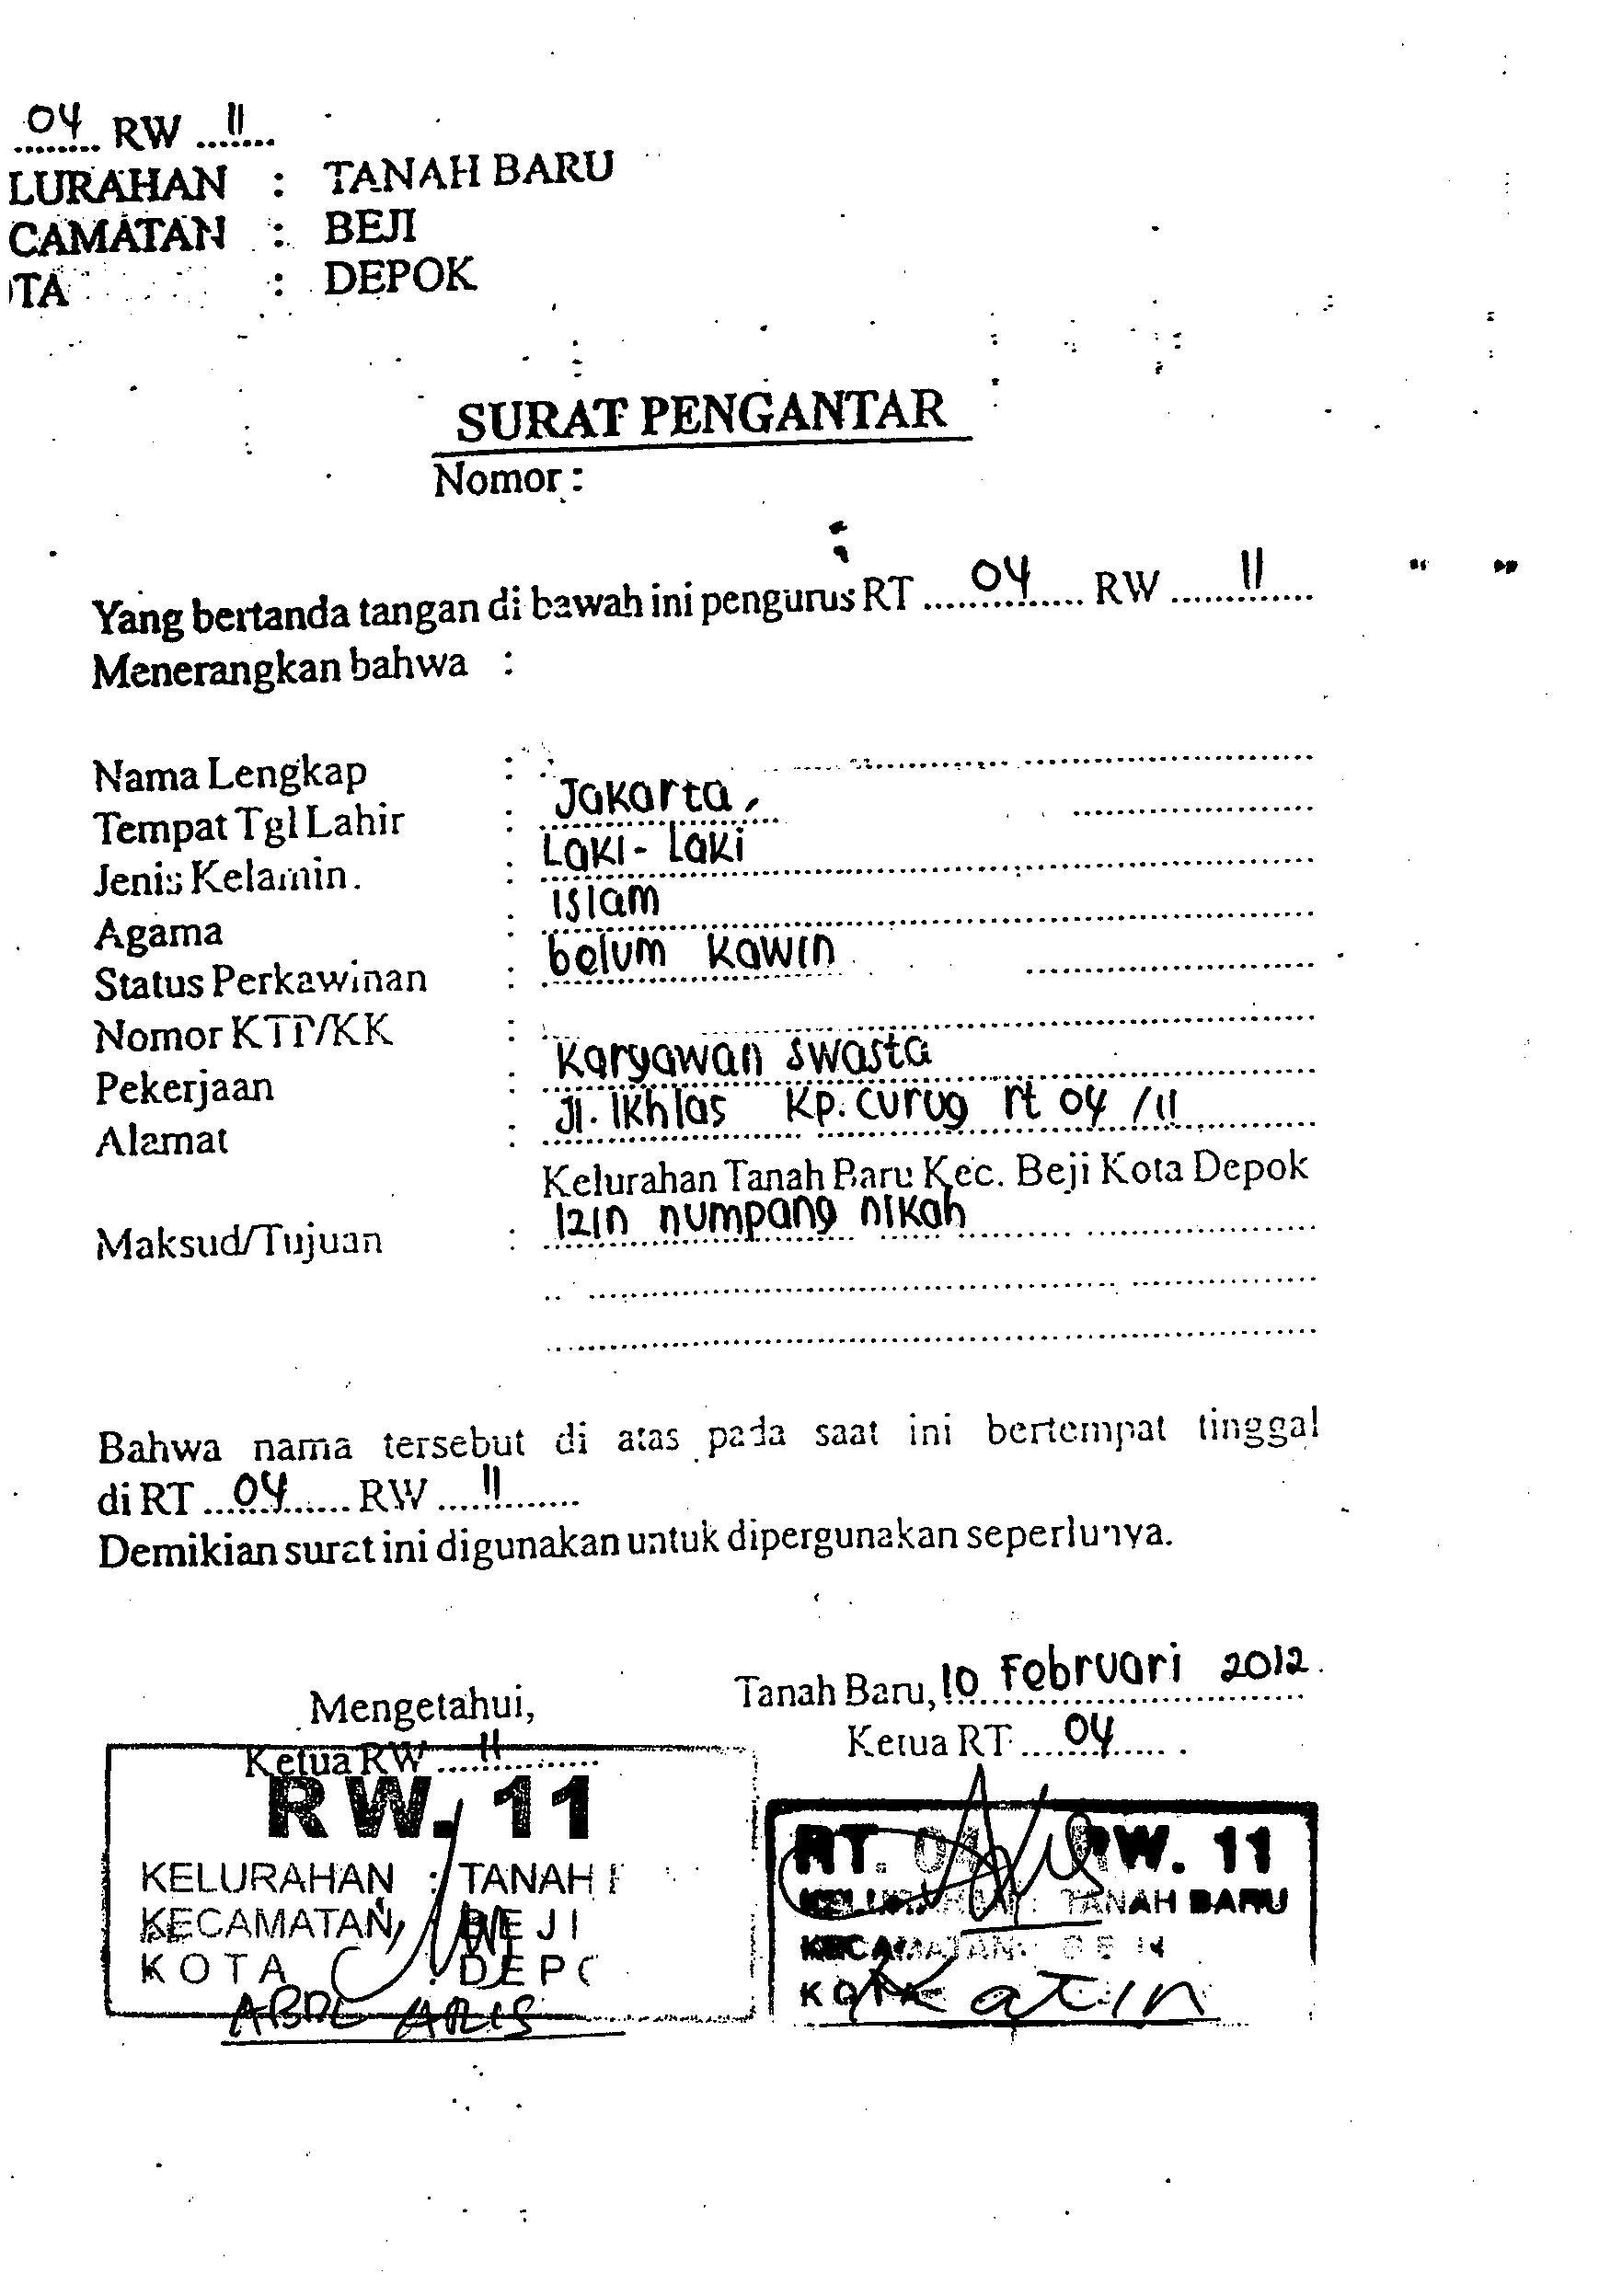 Surat Domisili Rt Genuardis Portal Picture